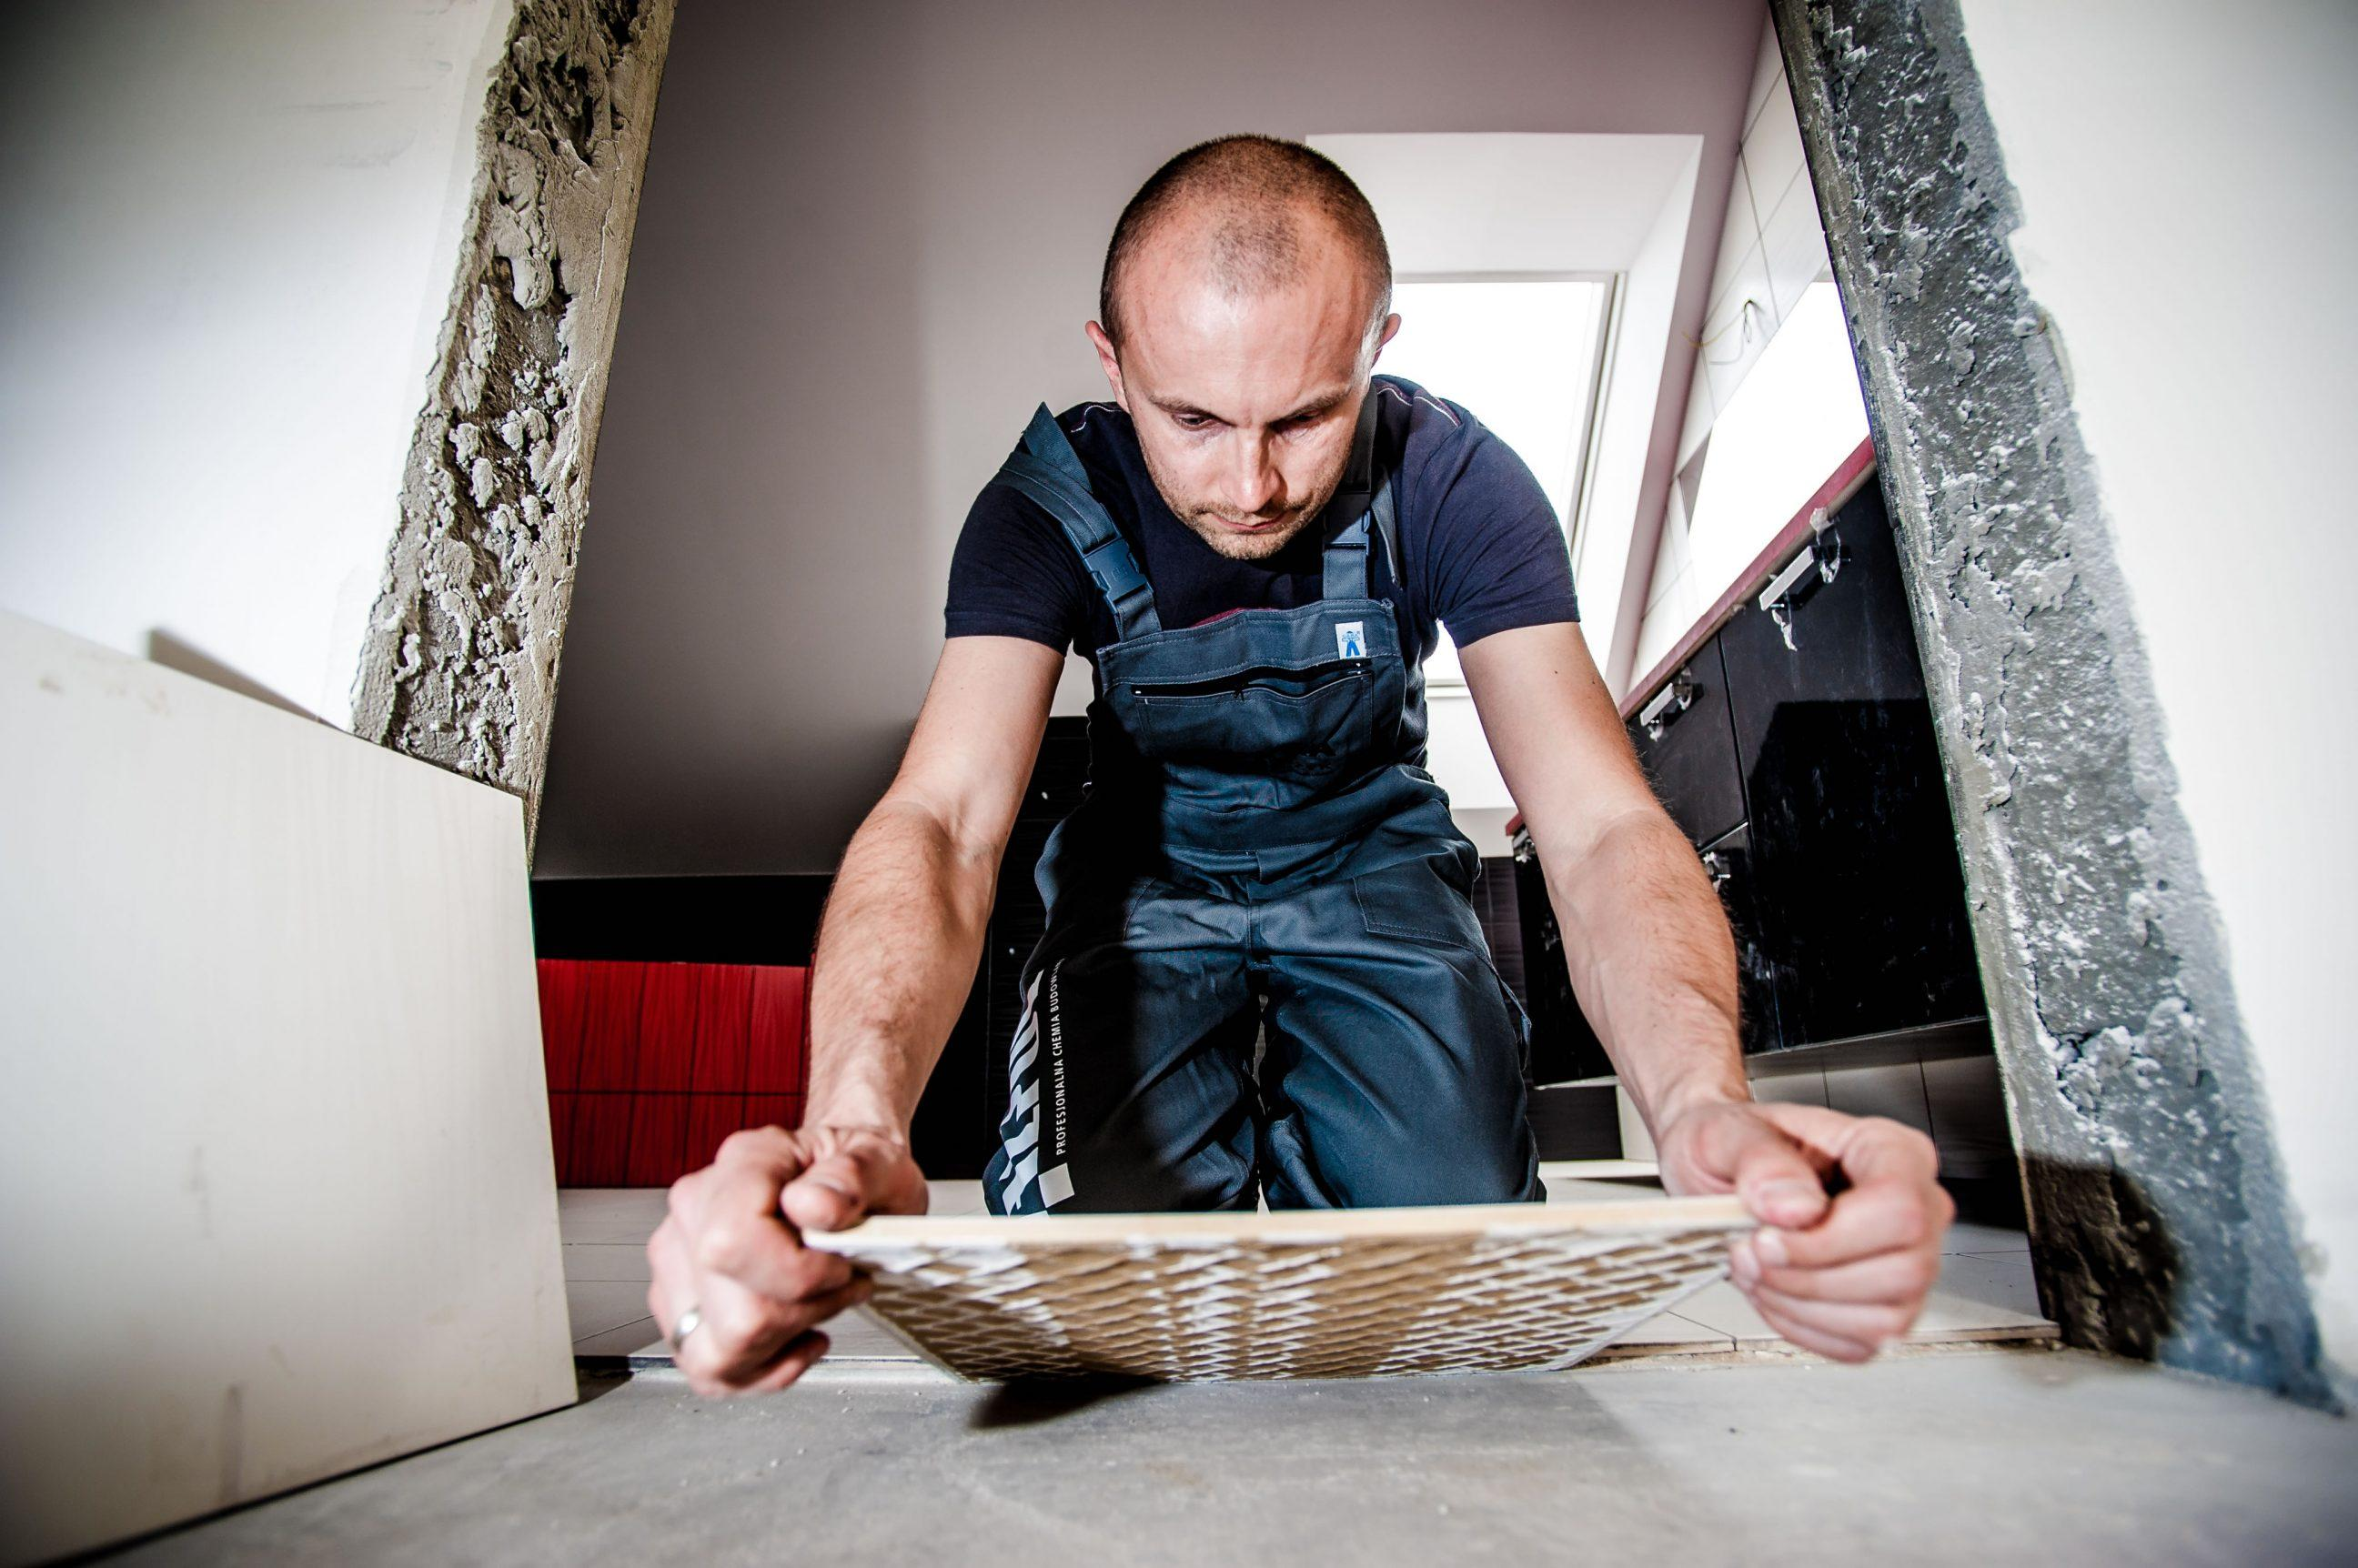 Installing tiles on floor